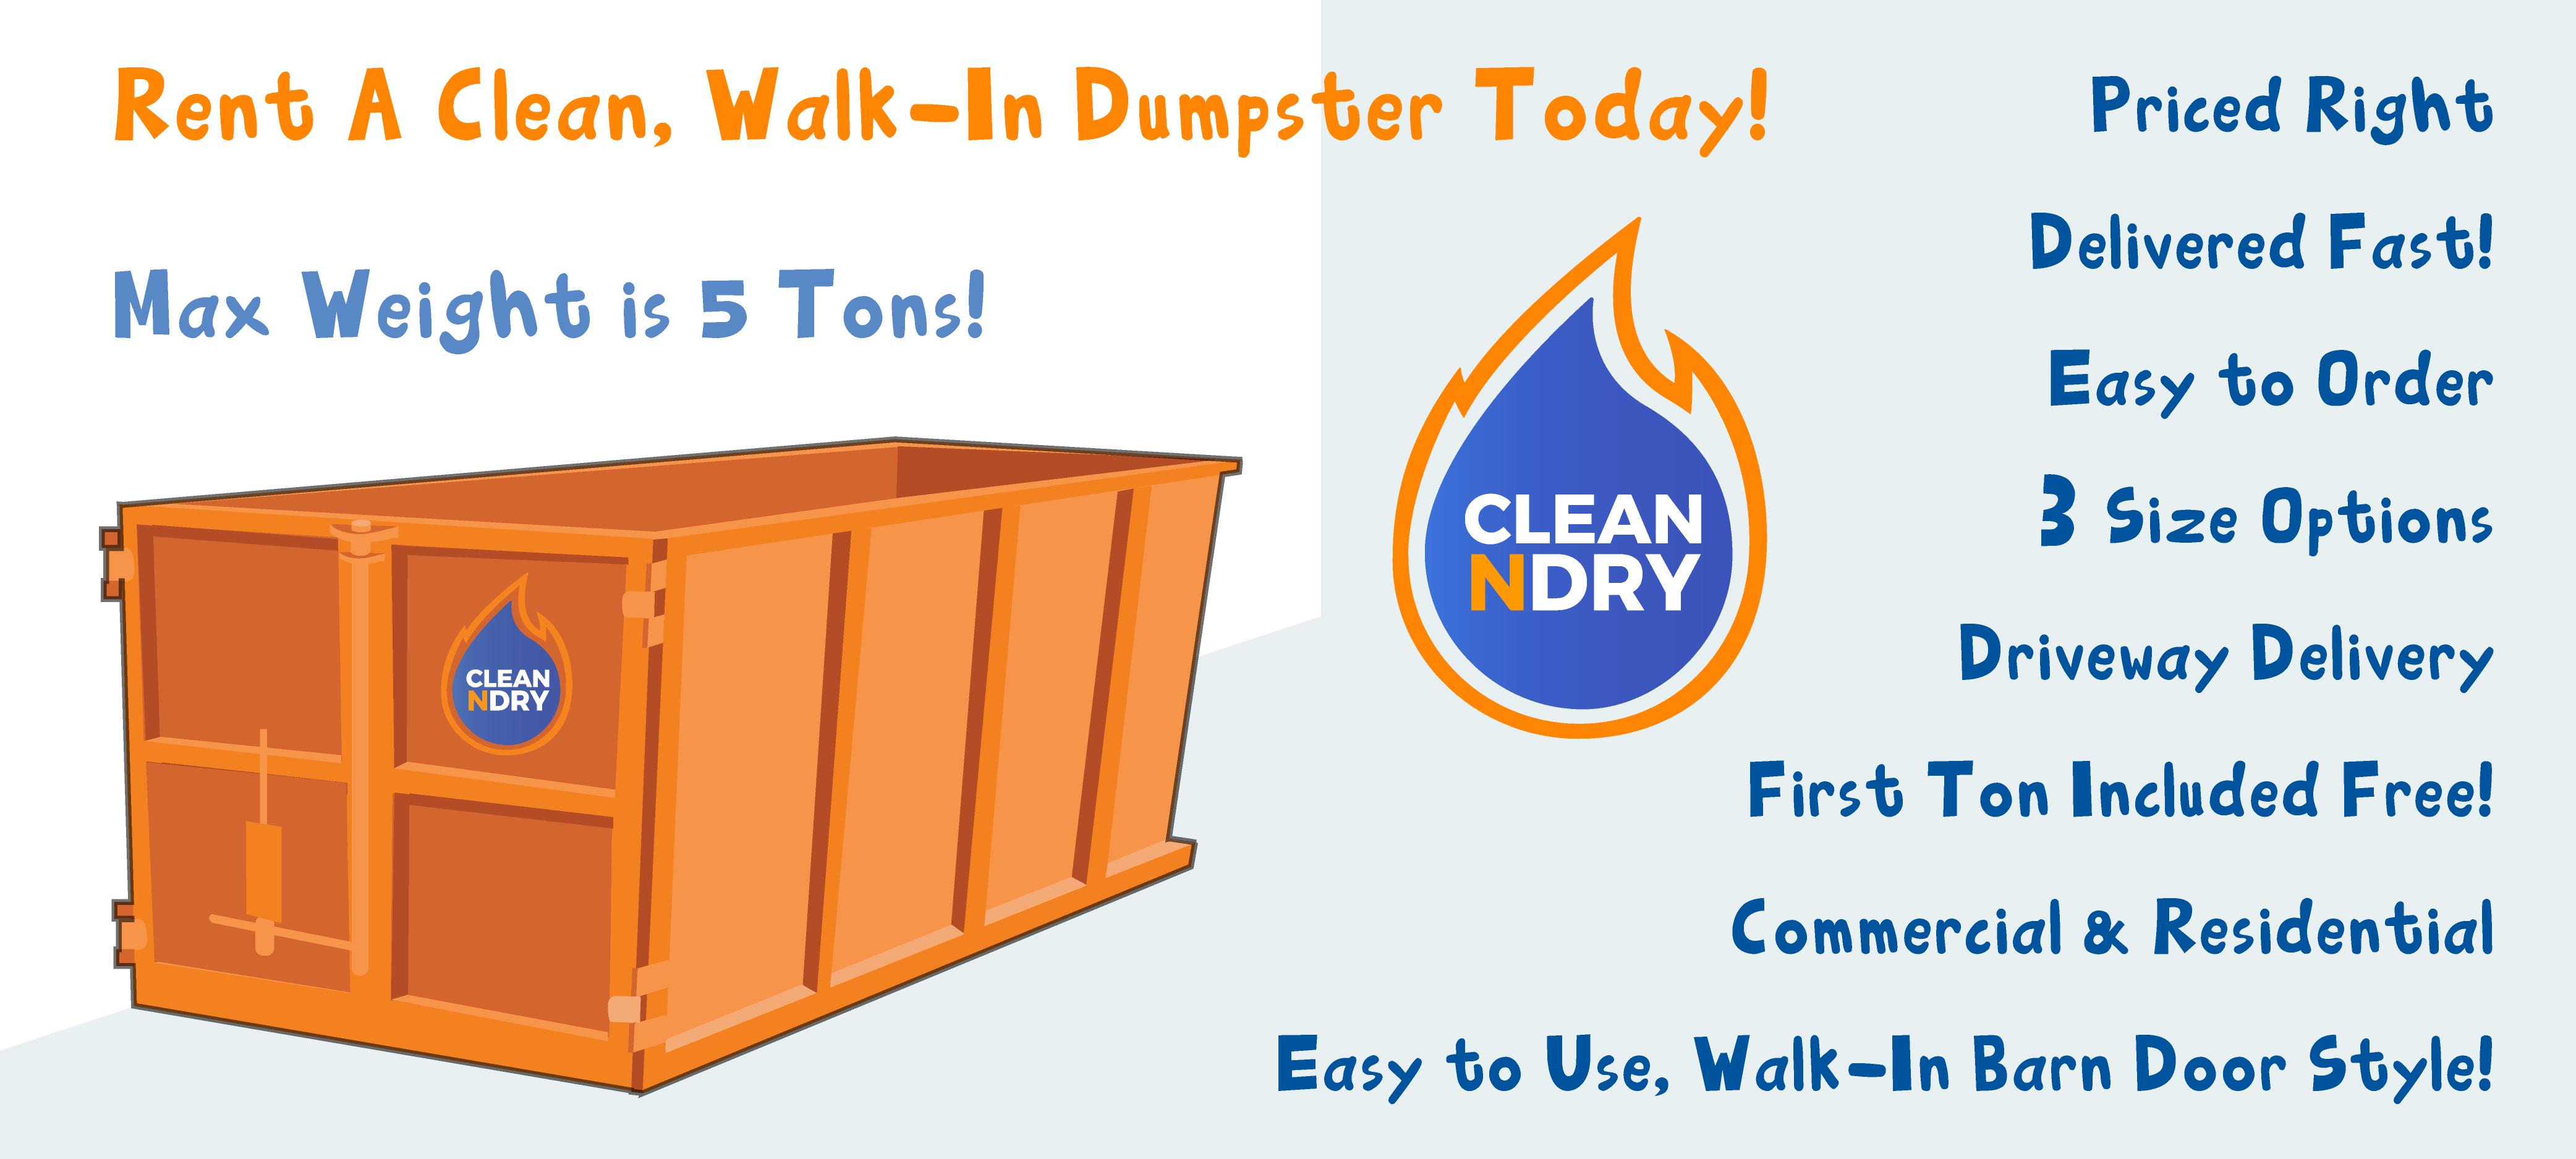 rent a dumpster roll off walk in dumpster rental orlando dumpster delivery-01-01